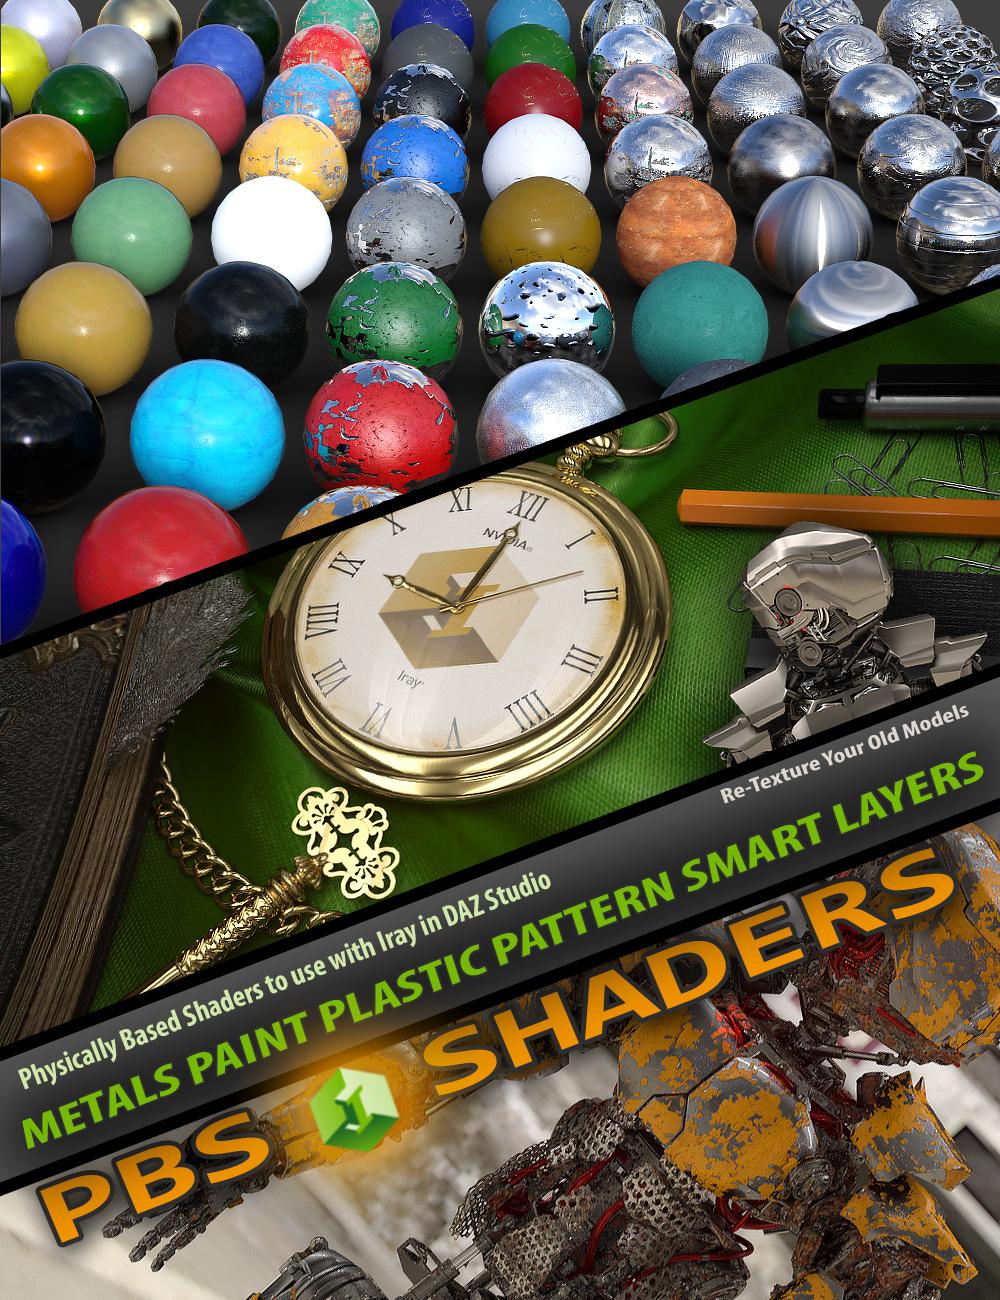 Mec4d PBS Shaders vol.1 for Iray by: Mec4D, 3D Models by Daz 3D